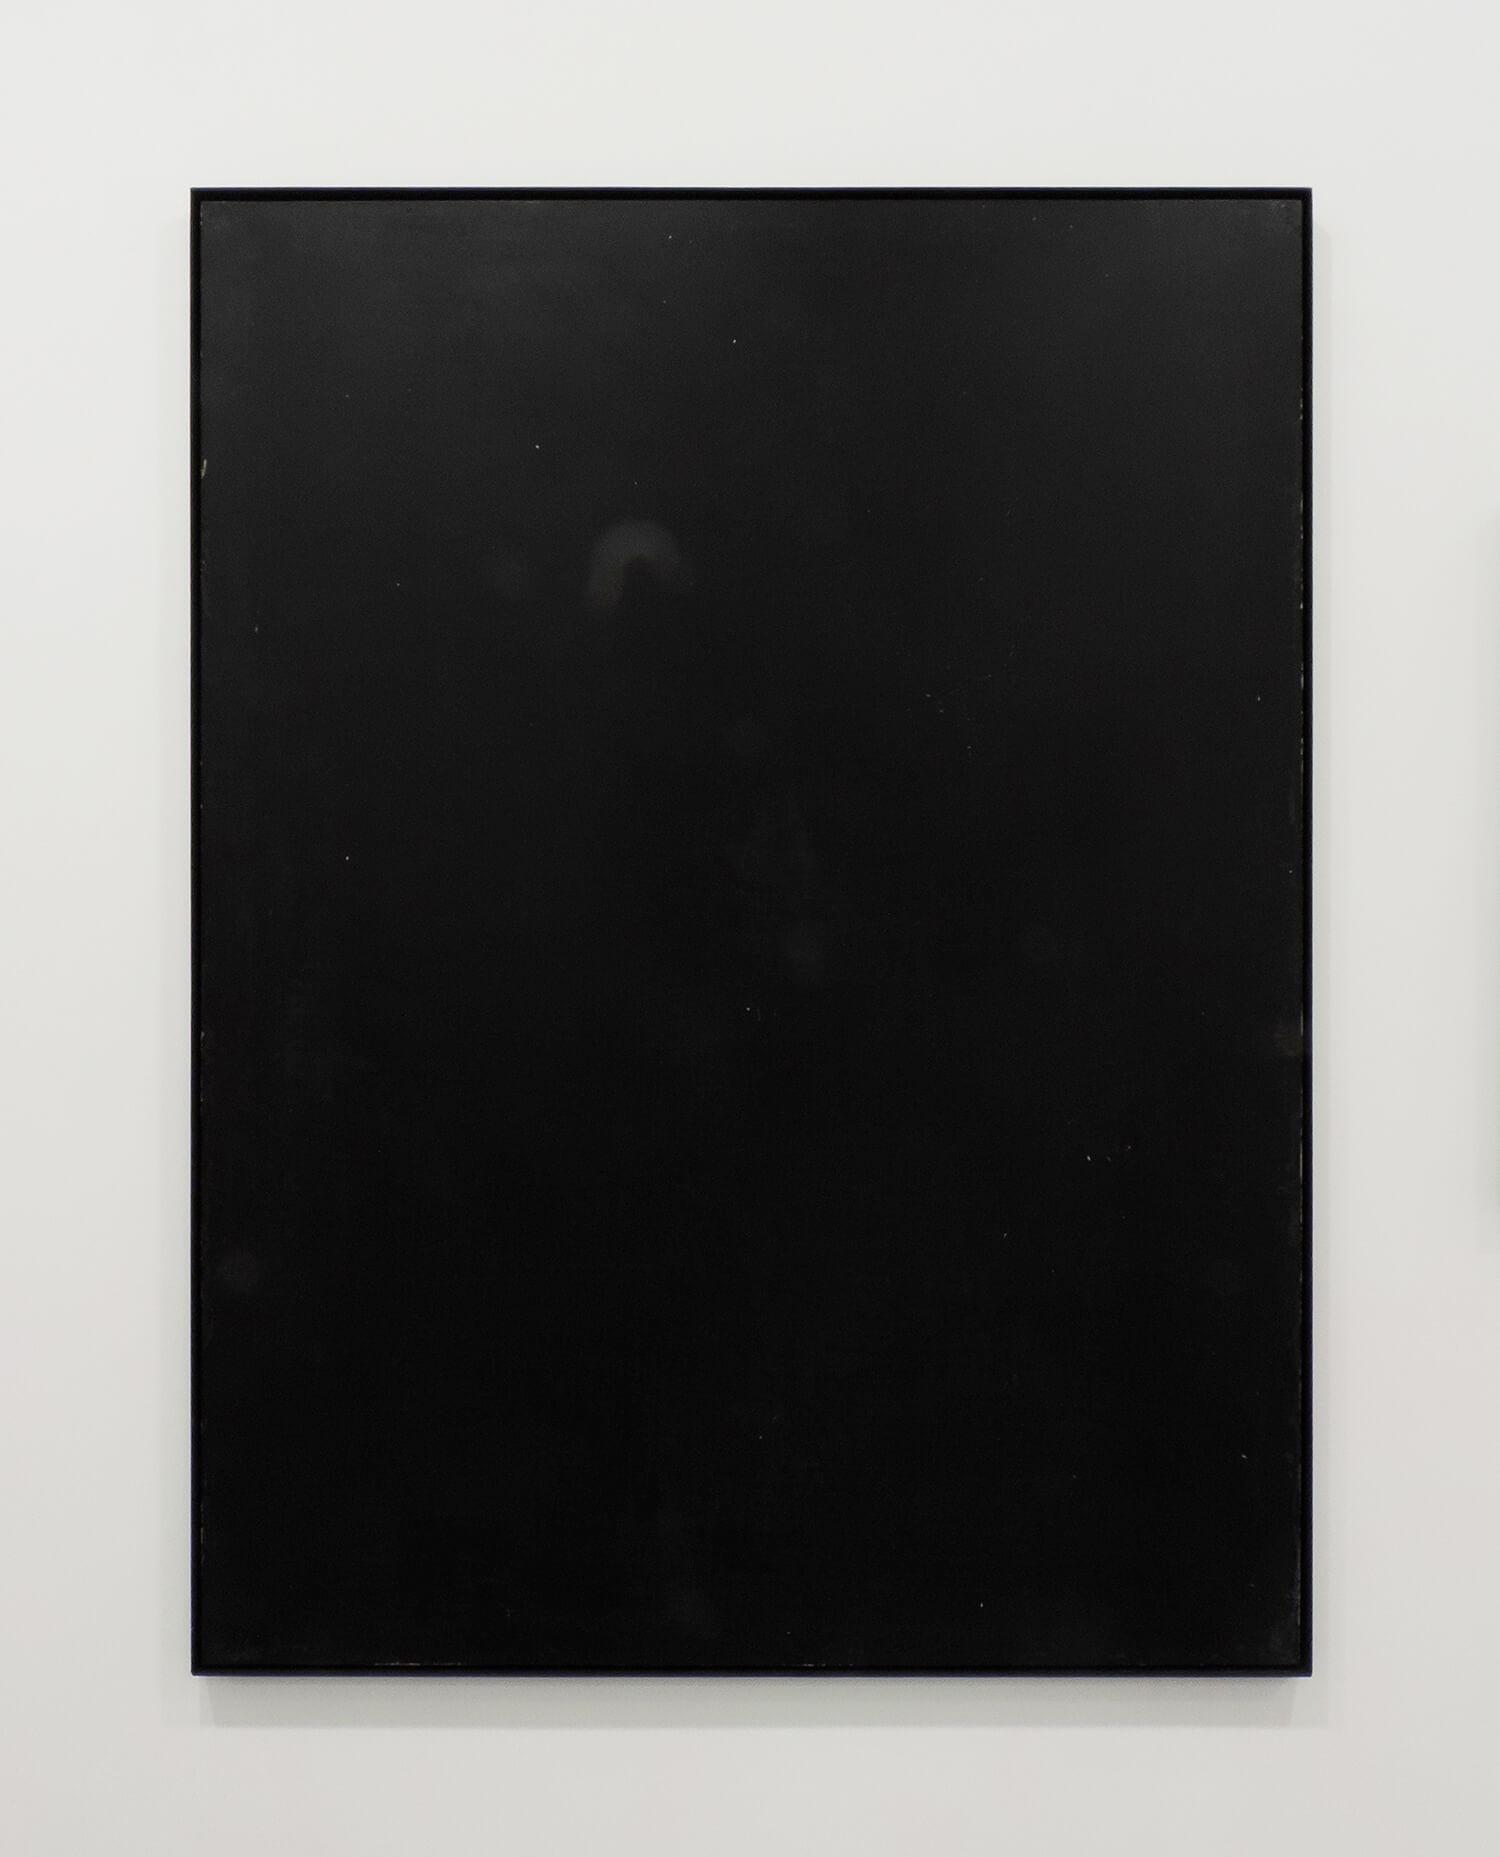 <b>black board</b><br>木製パネルに綿布、黒板塗料、鉄製フレーム<br>1234 × 930 mm<br>2009